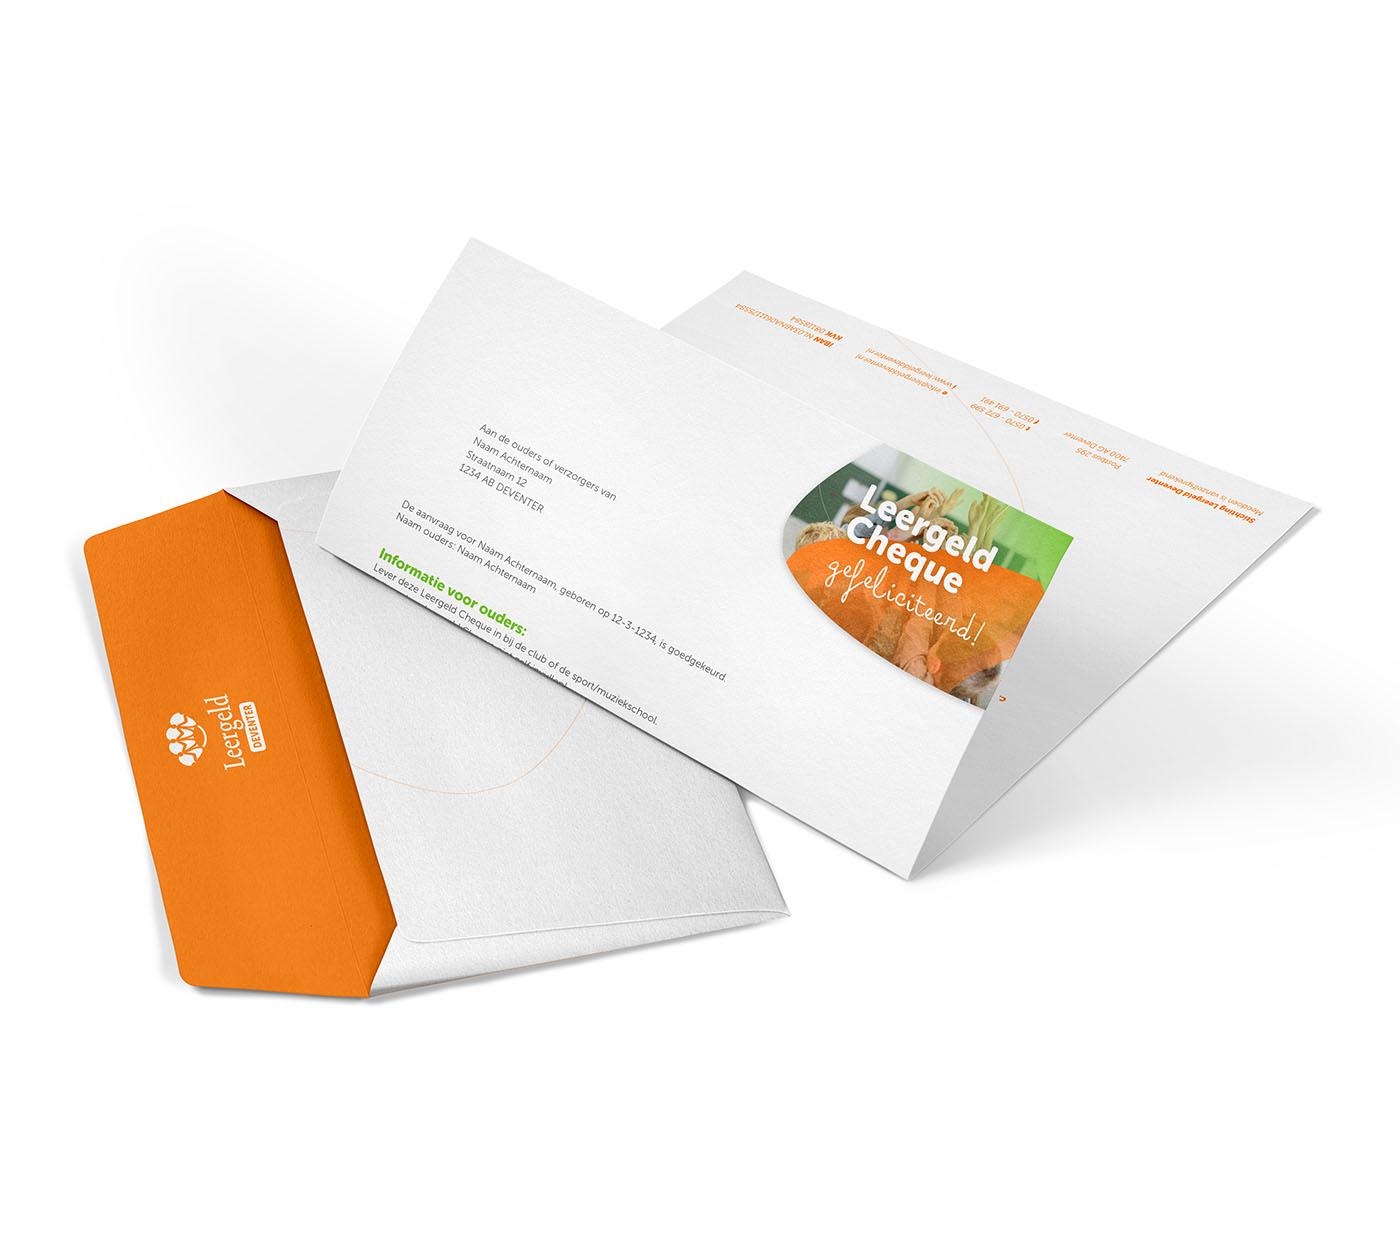 LG-cheque